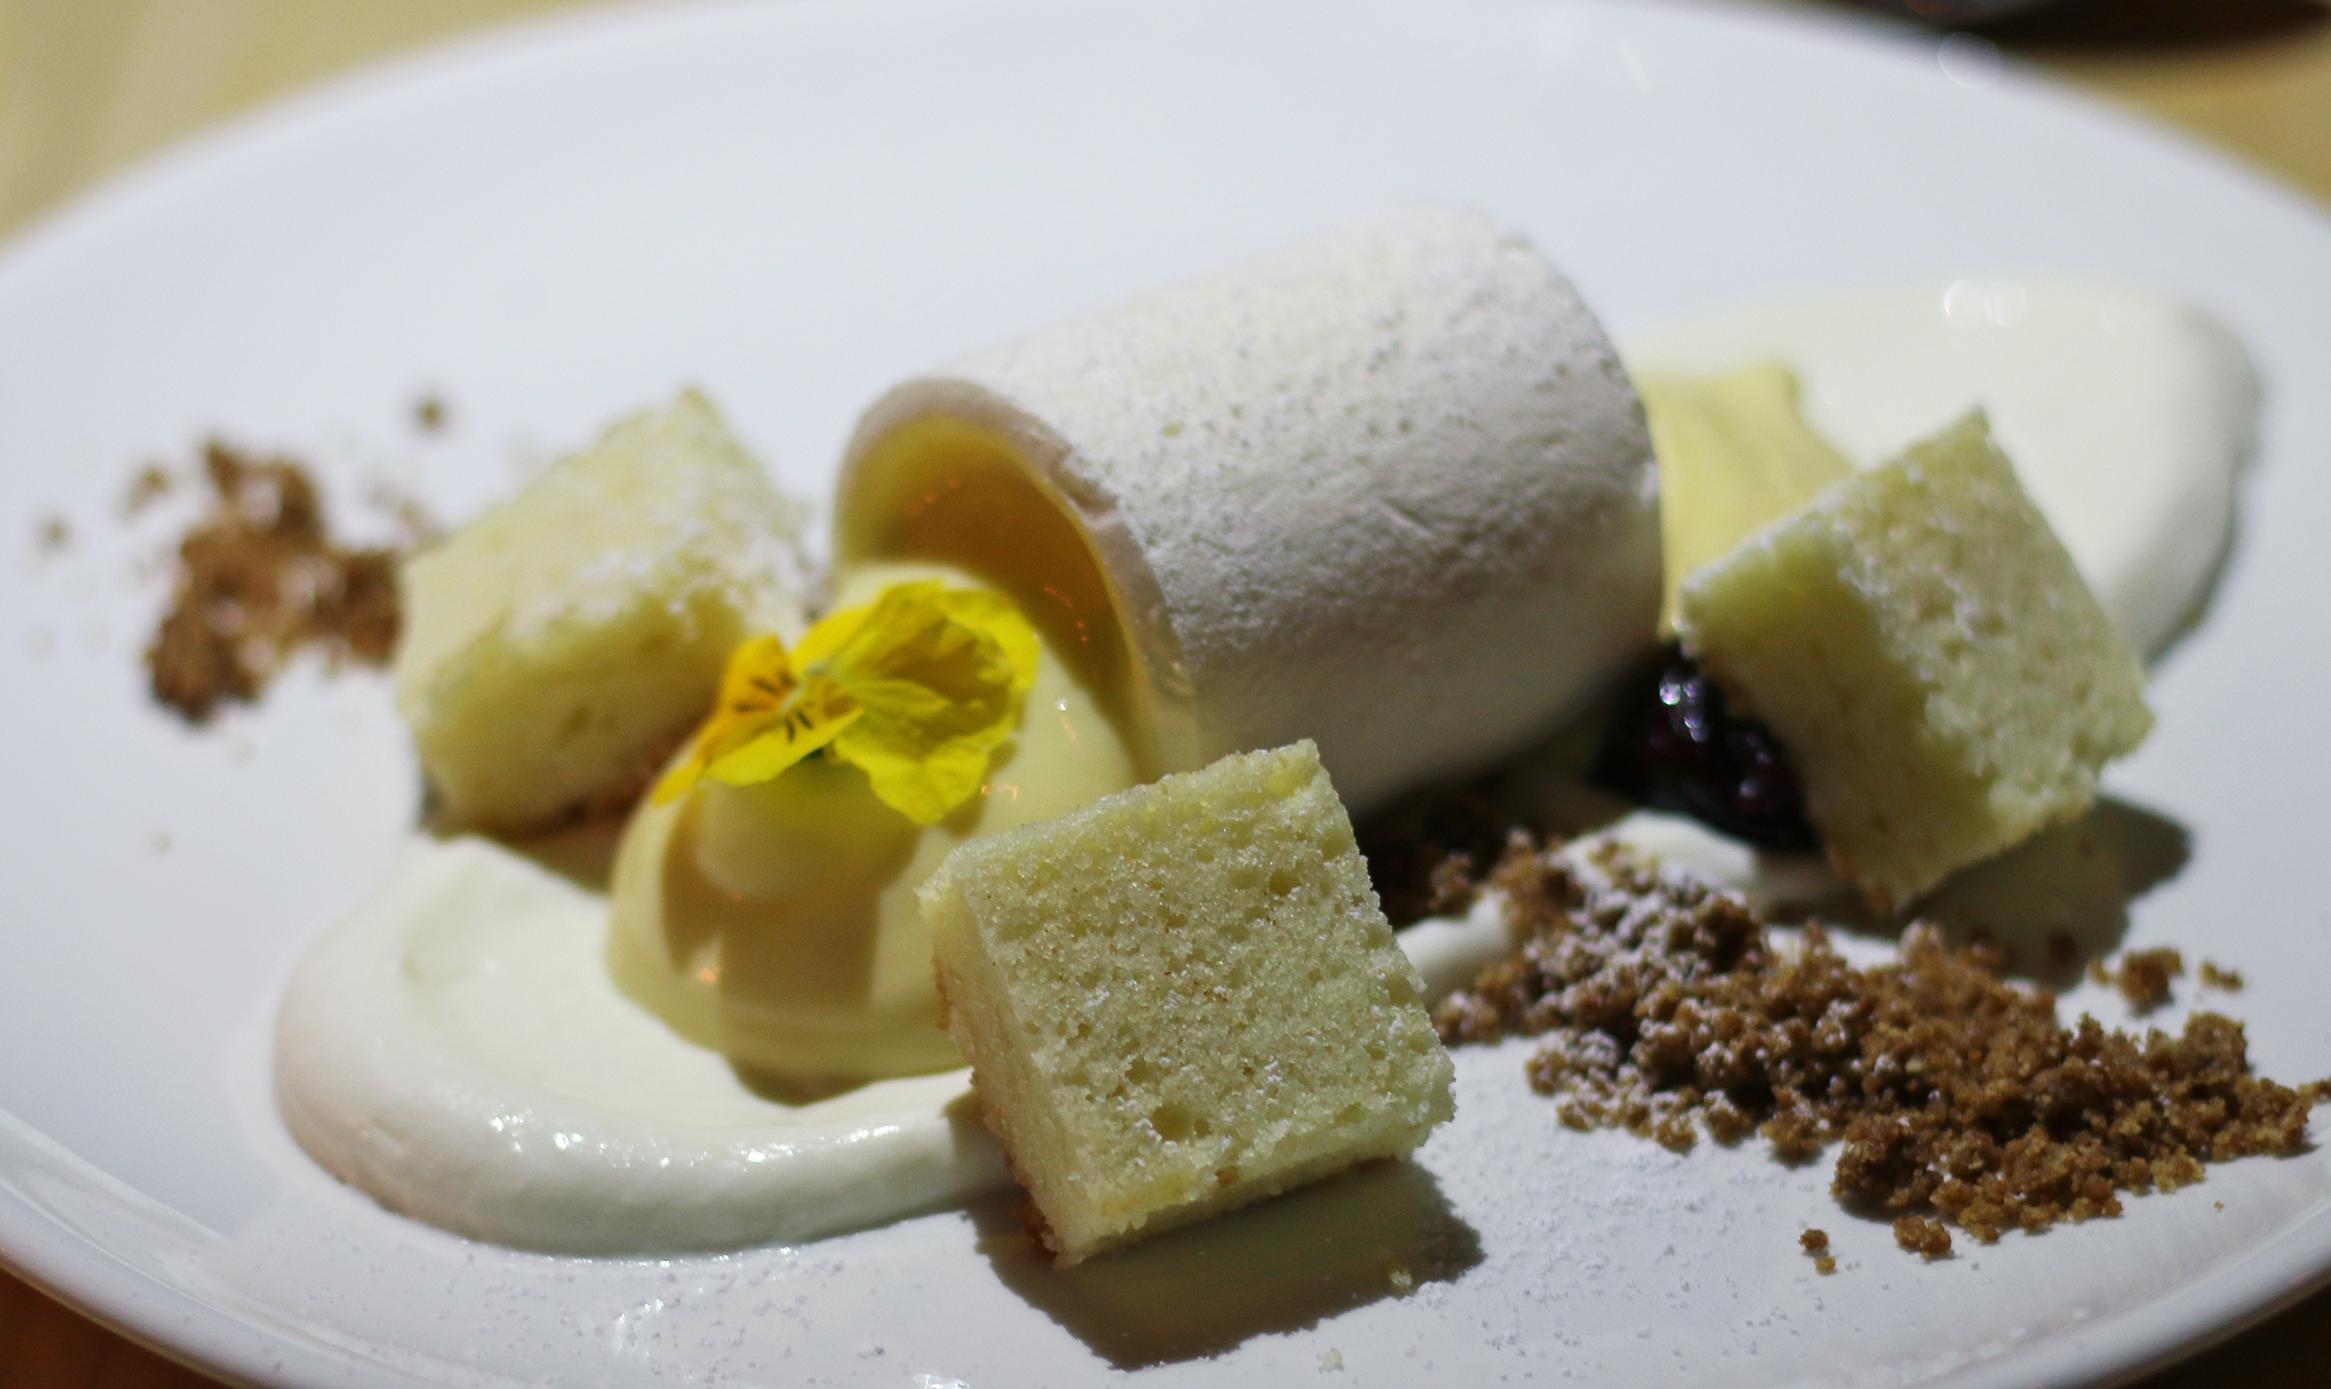 Meyer Lemon Eton Mess: Lemon Curd, Meringue, Pound Cake, Whipped Creme Fraiche